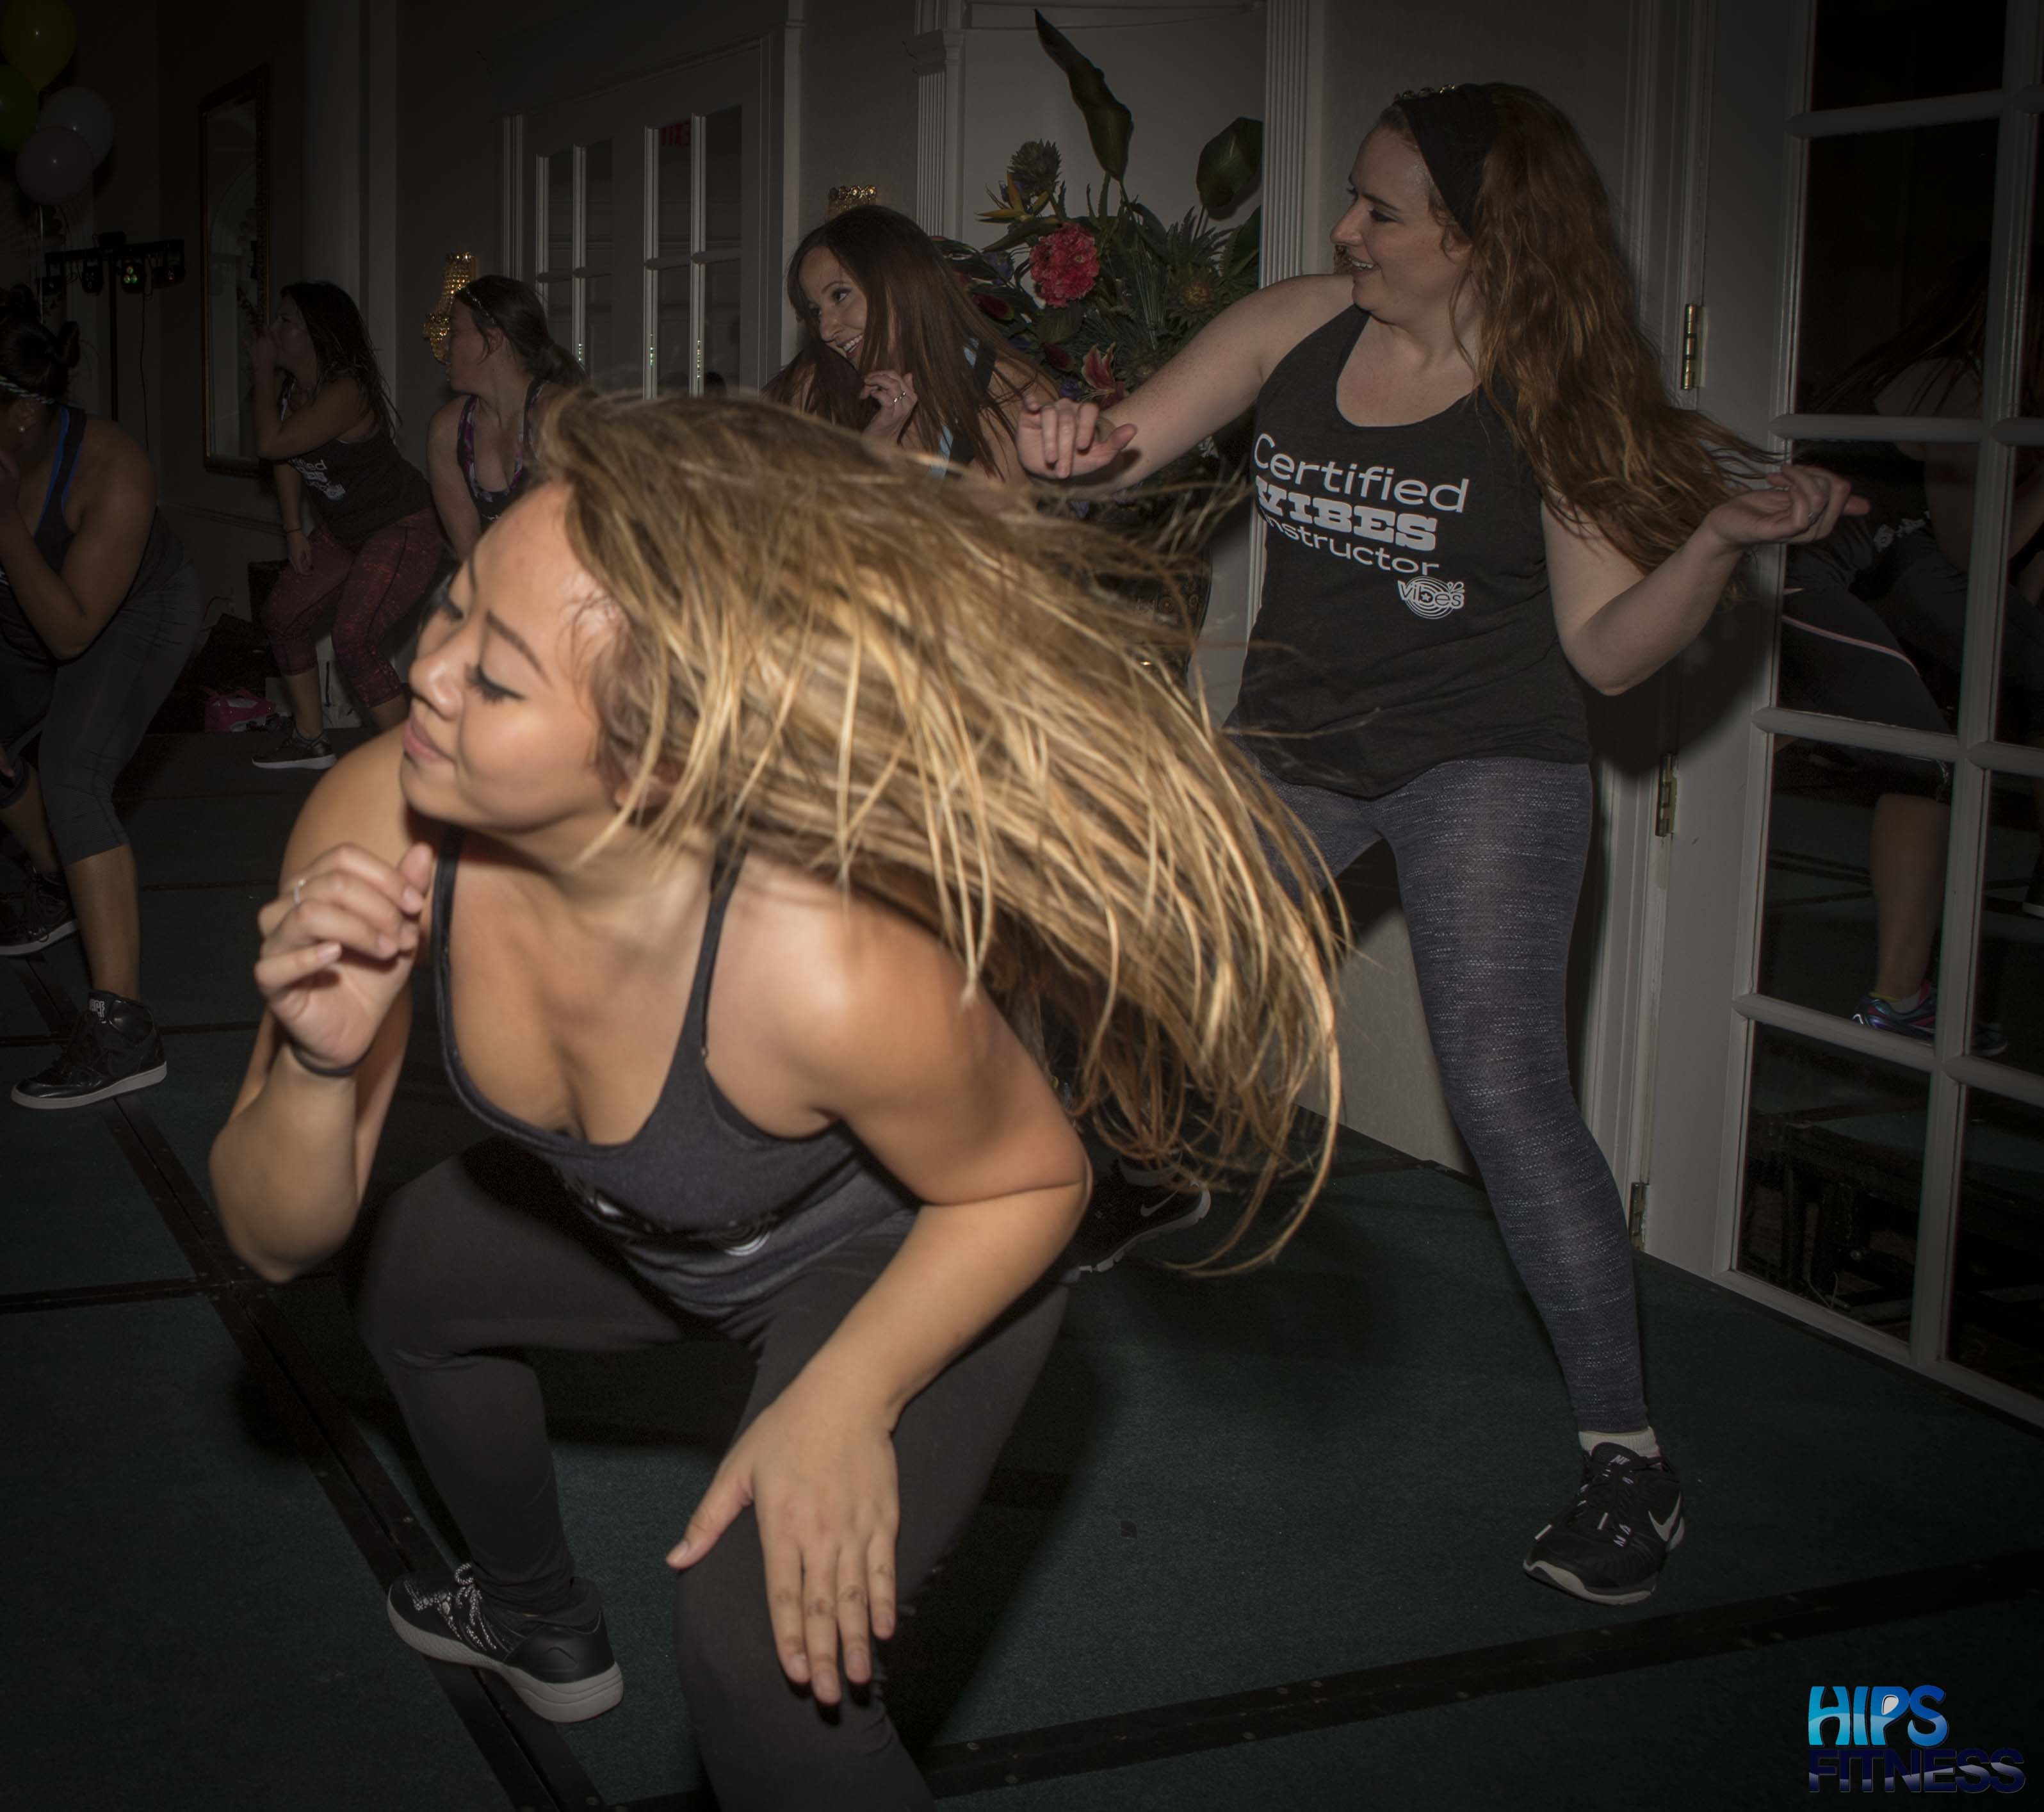 Hips_Fitness_Dec_2016-43